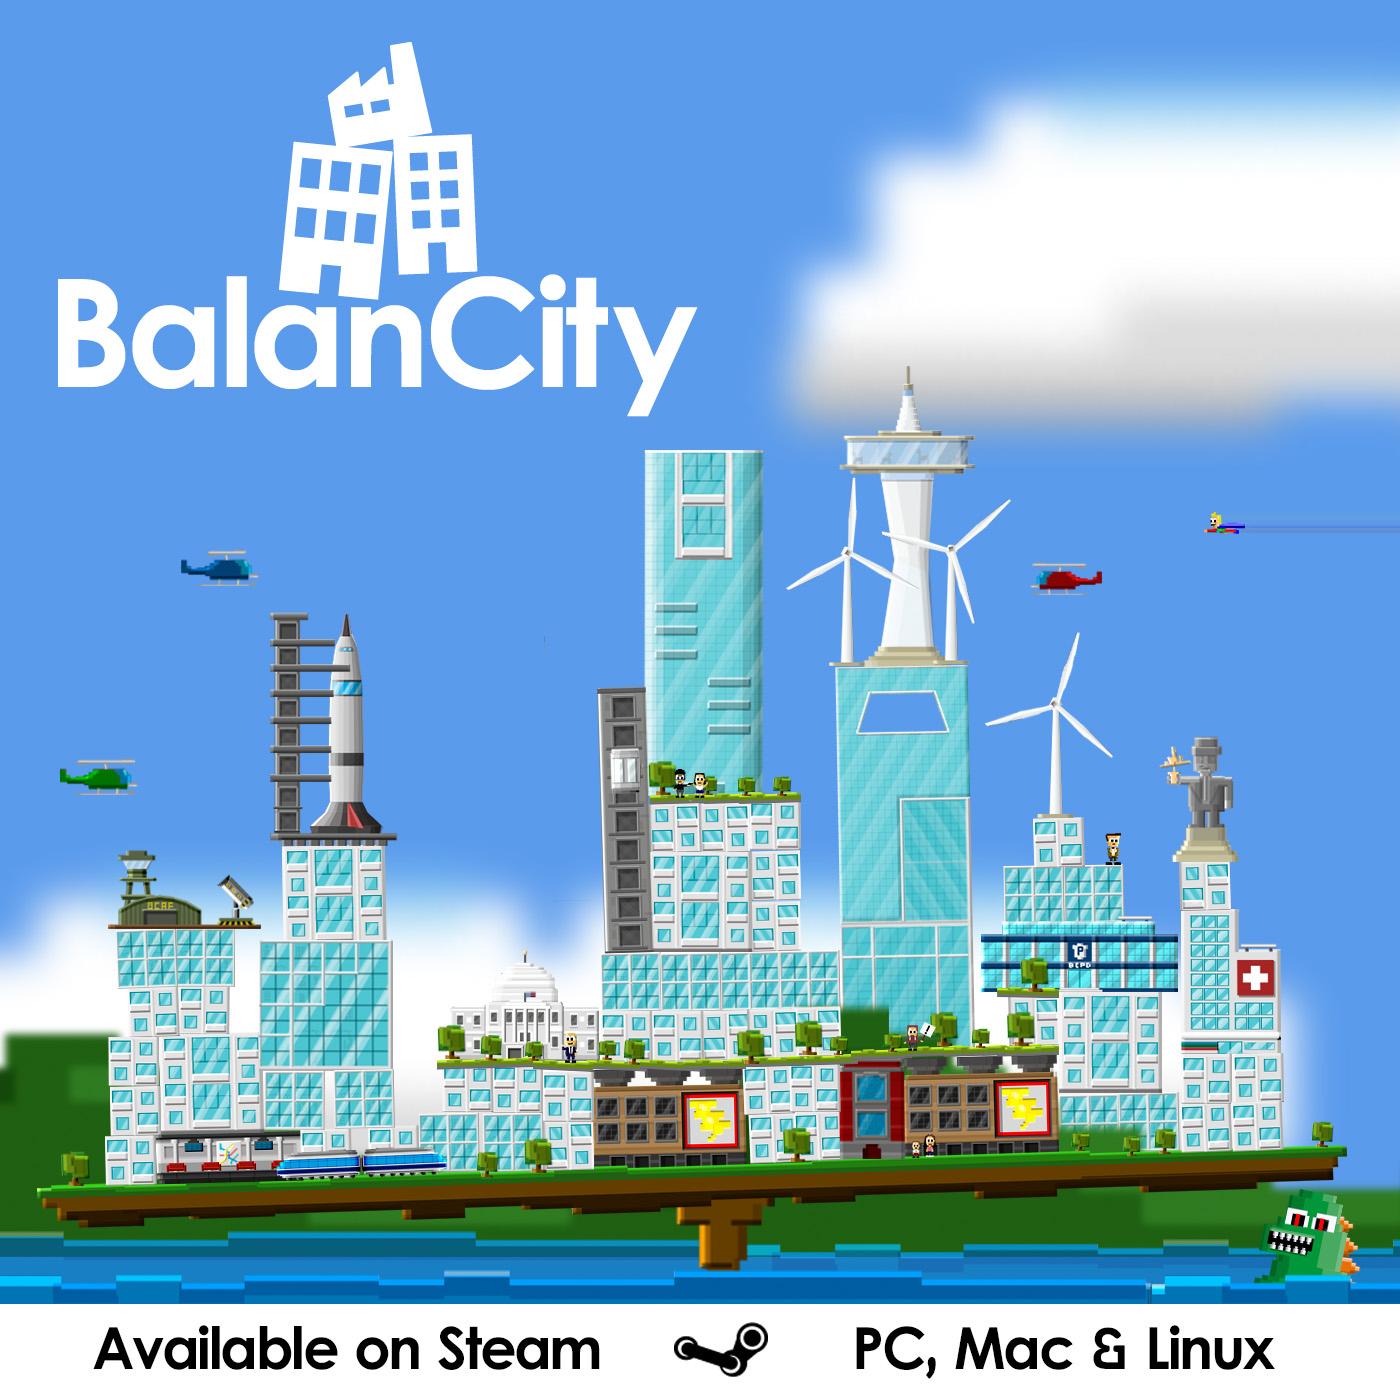 BalanCity Released On Steam! News